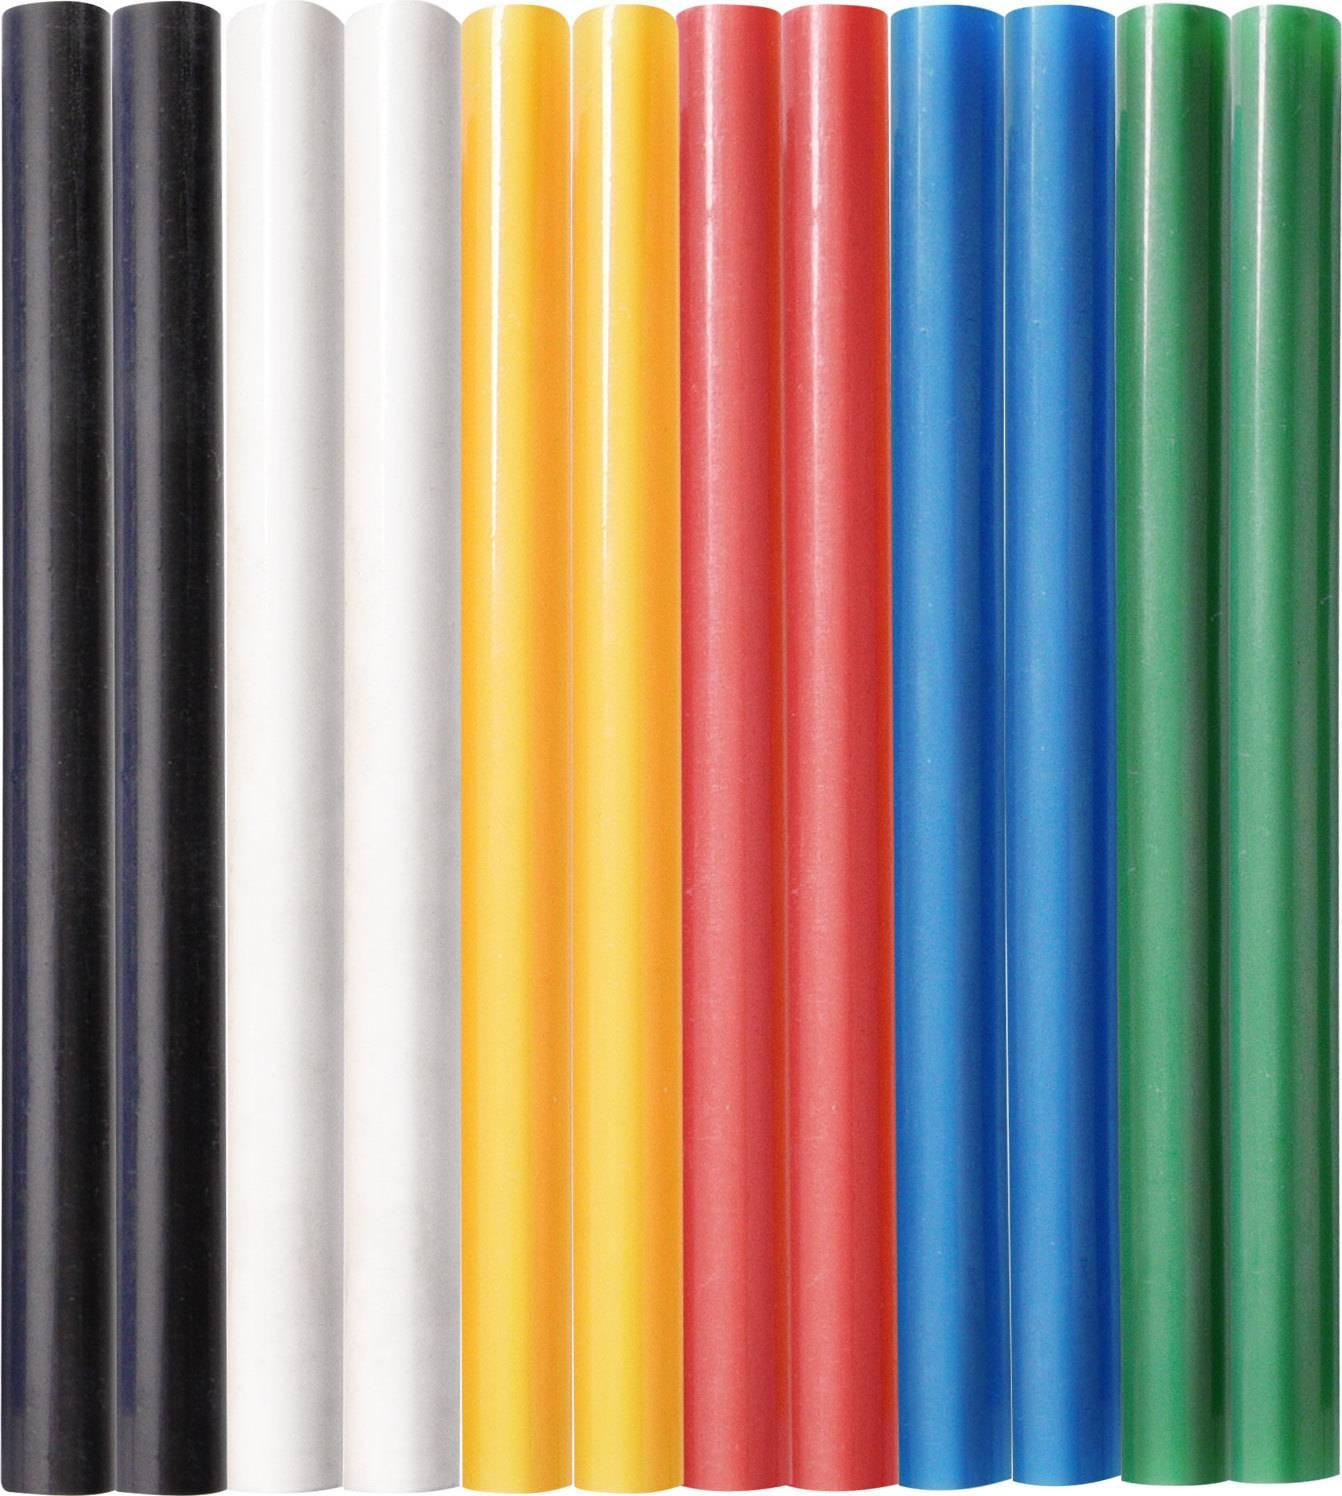 tyčinky tavné, mix barev, pr.7,2x100mm, 12ks 9908 EXTOL CRAFT